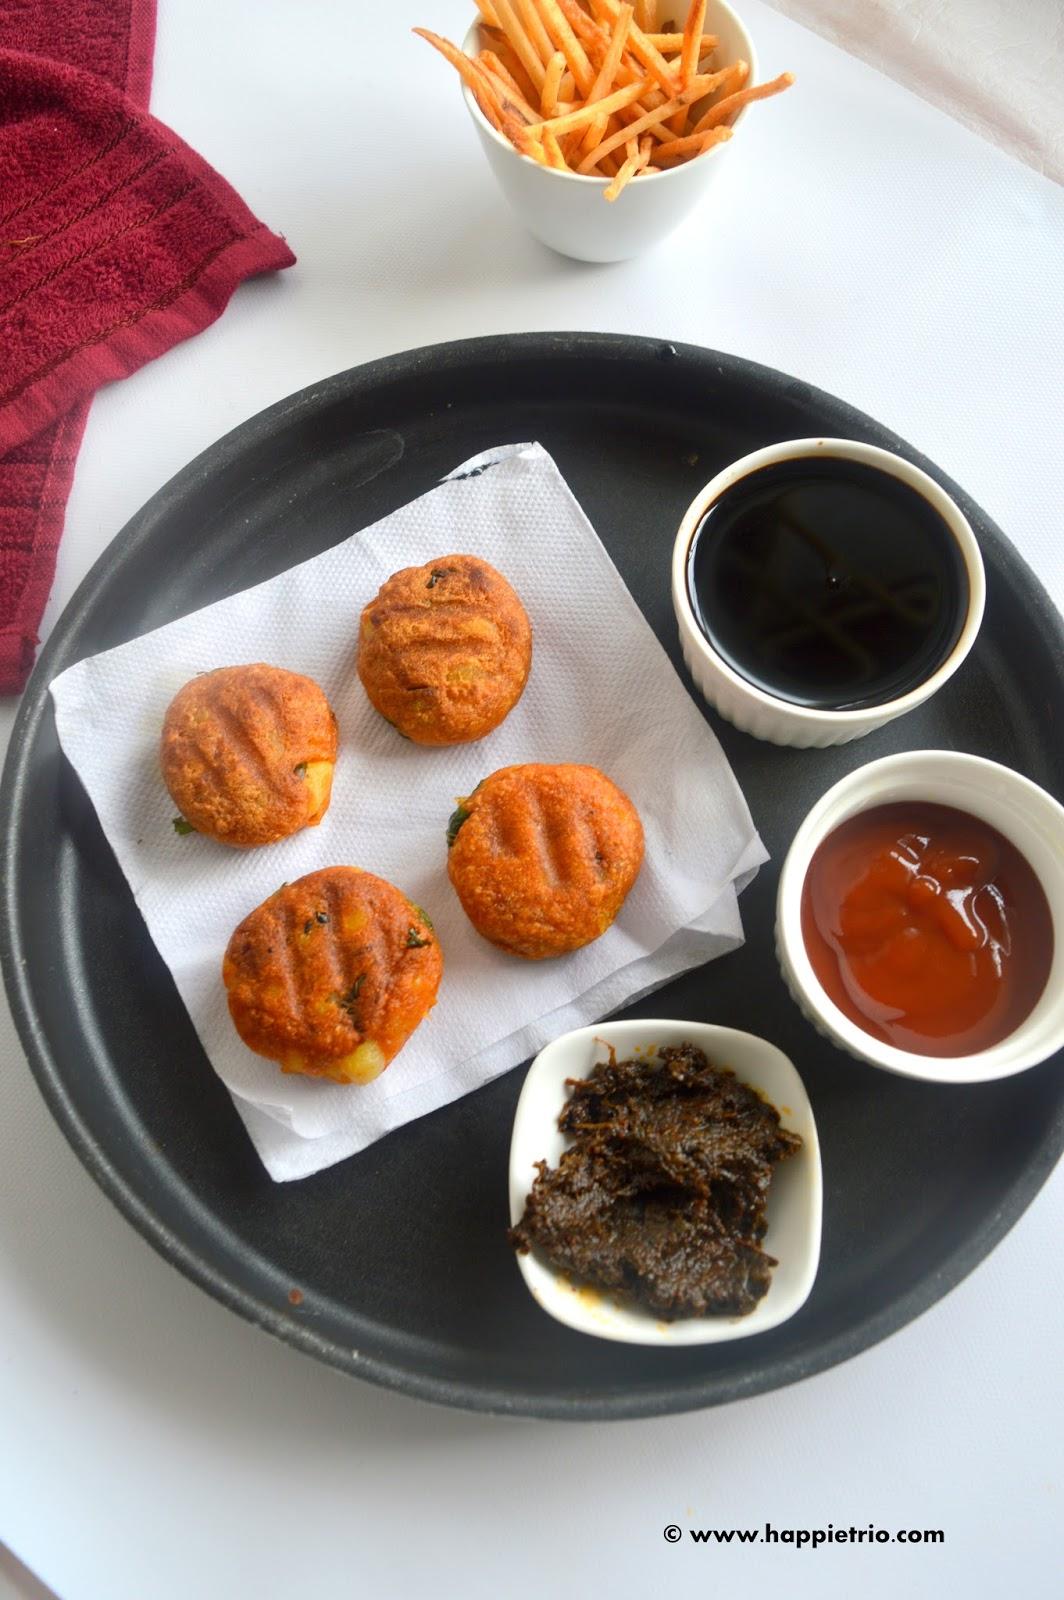 Grilled aloo tikki recipe aloo ki tikki recipe potato patties aloo tikki is one of the famous north indian street food every region of india have their own variations in their aloo tikki forumfinder Gallery